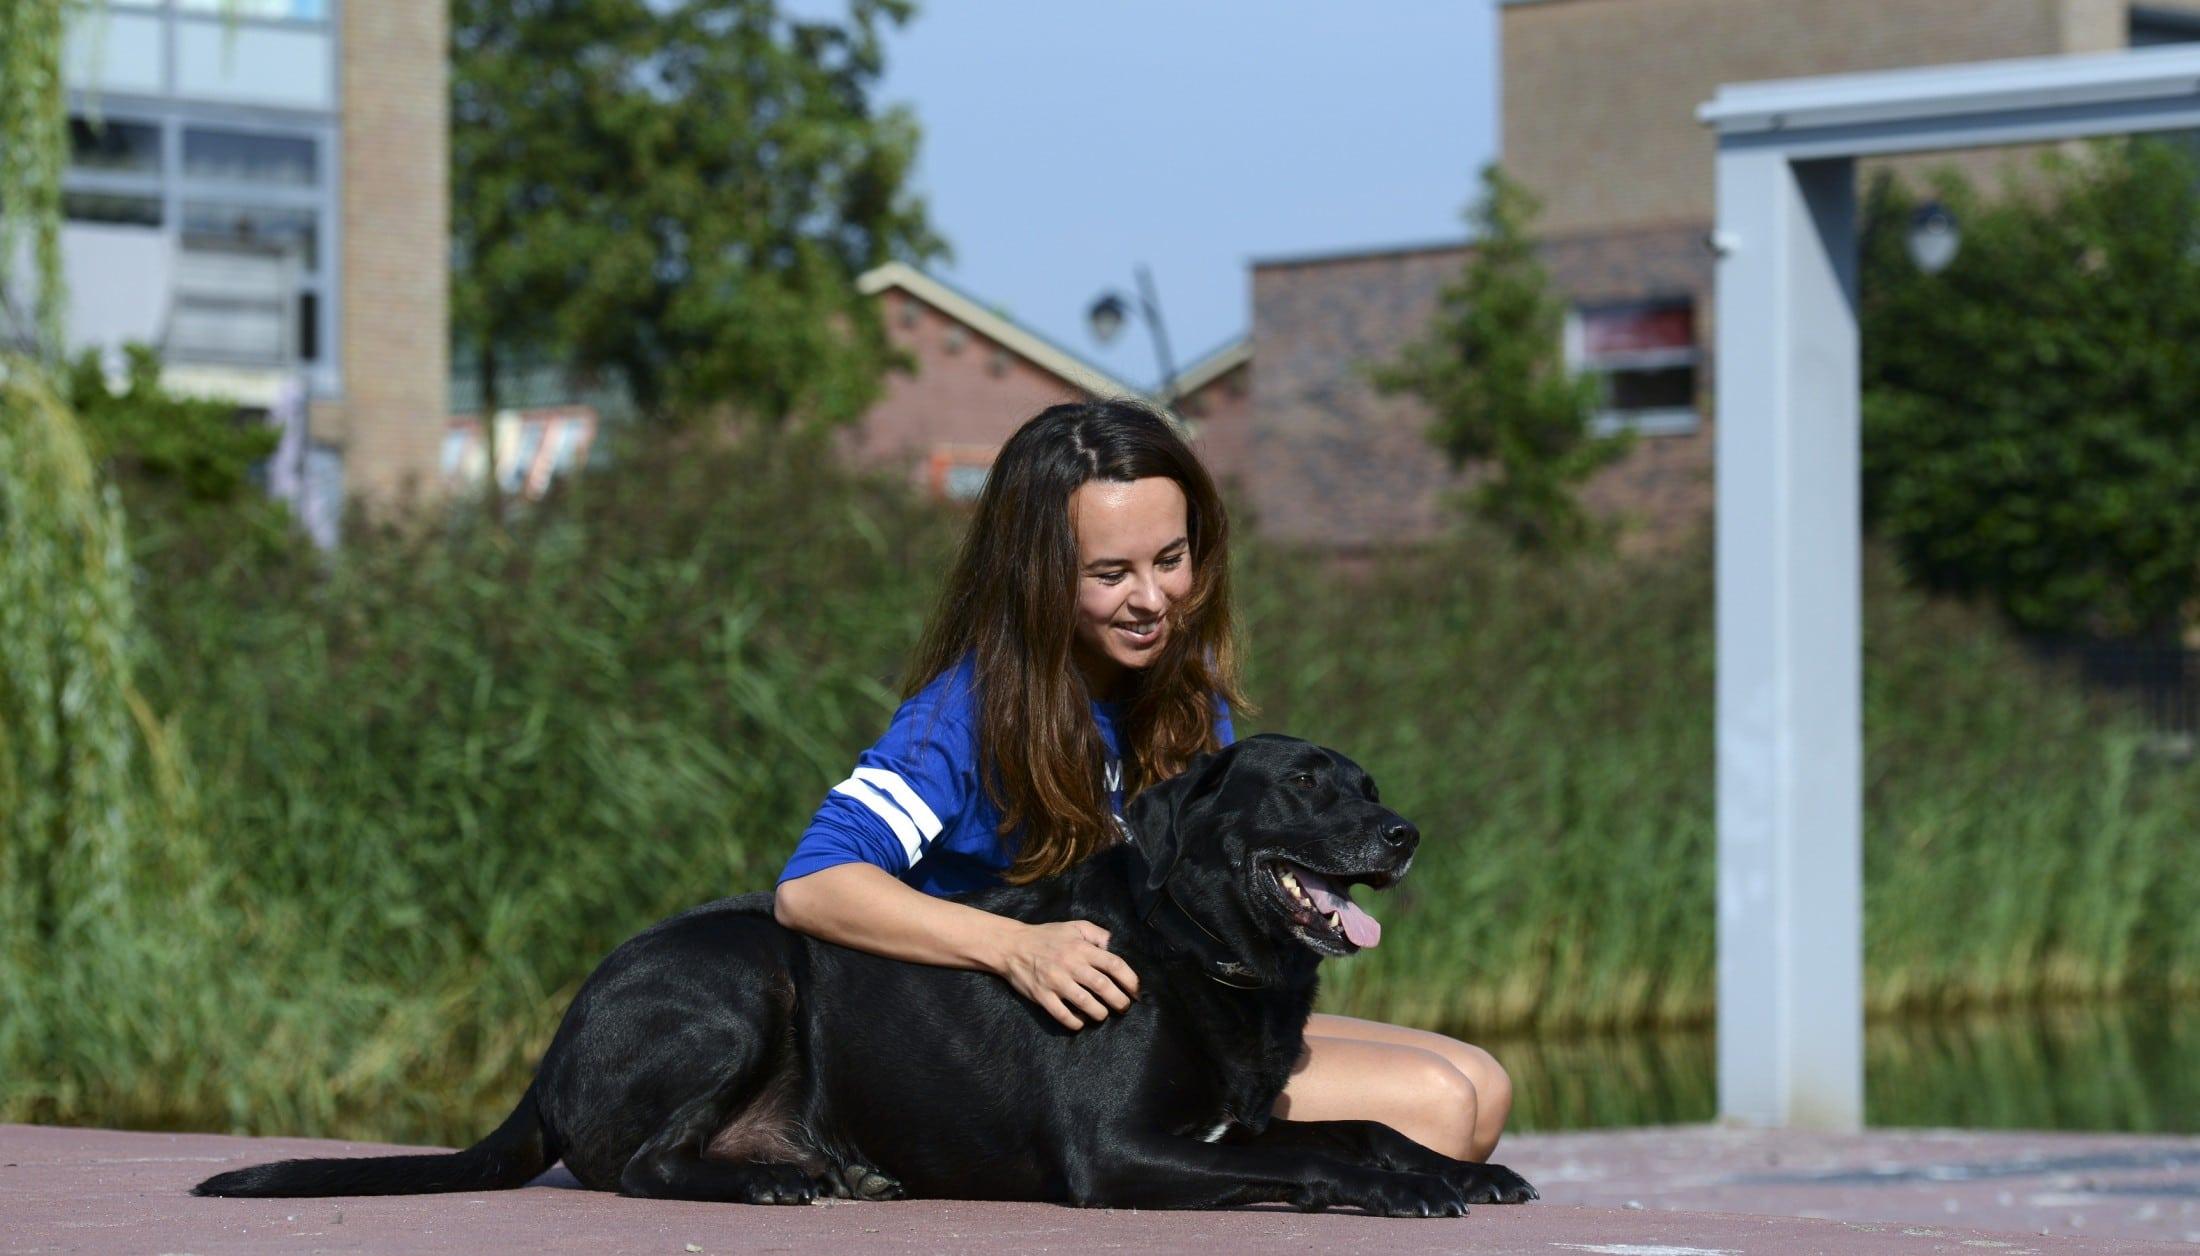 Vathorst meisje met hond